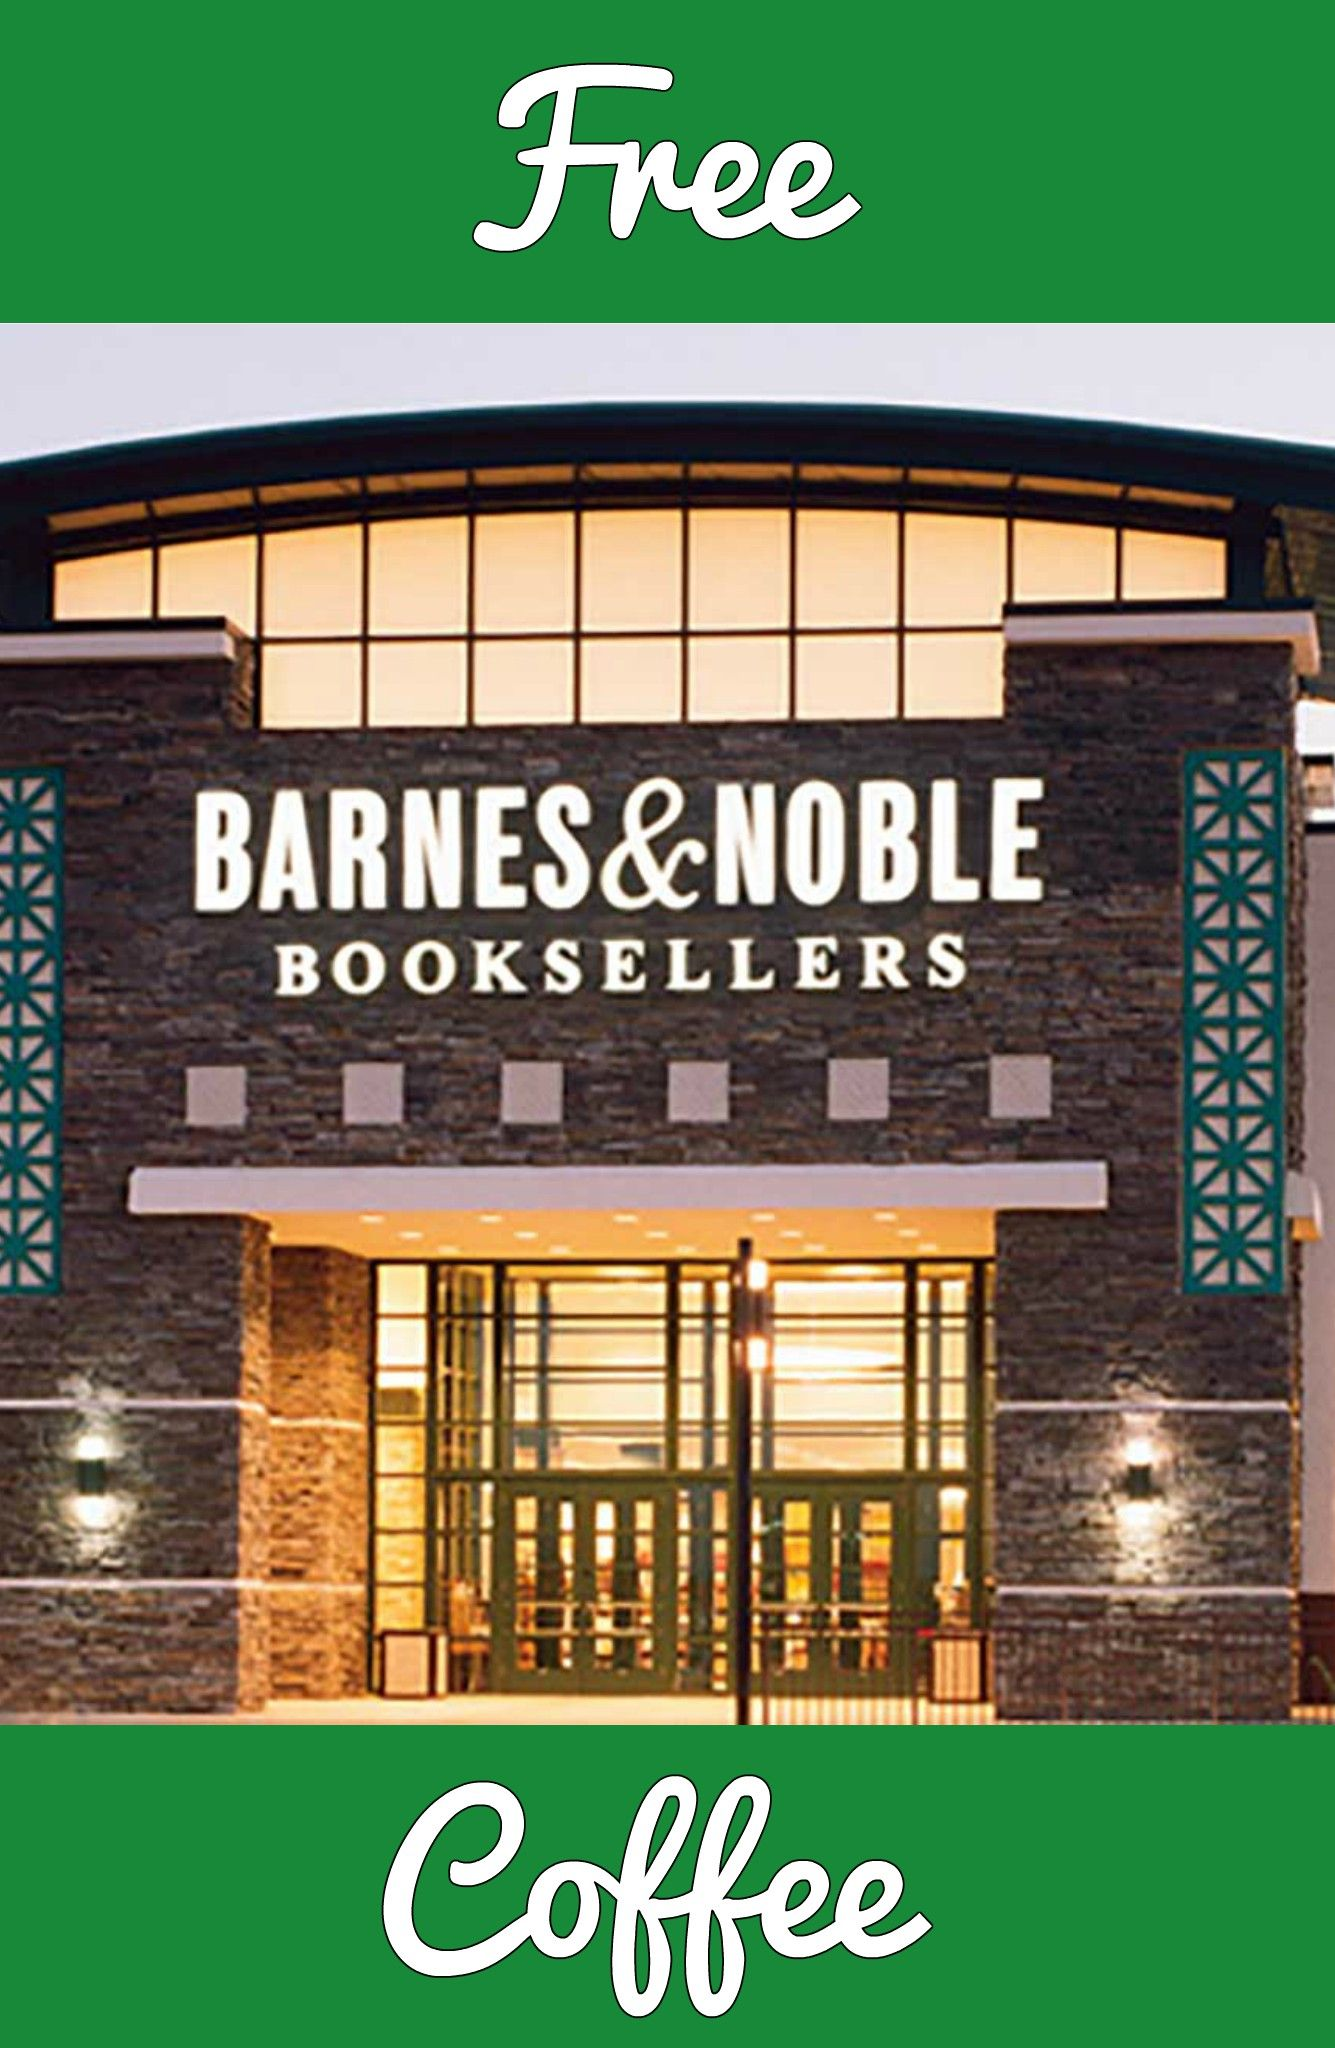 TMobile Tuesdays FREE Barnes & Noble Coffee, Movie